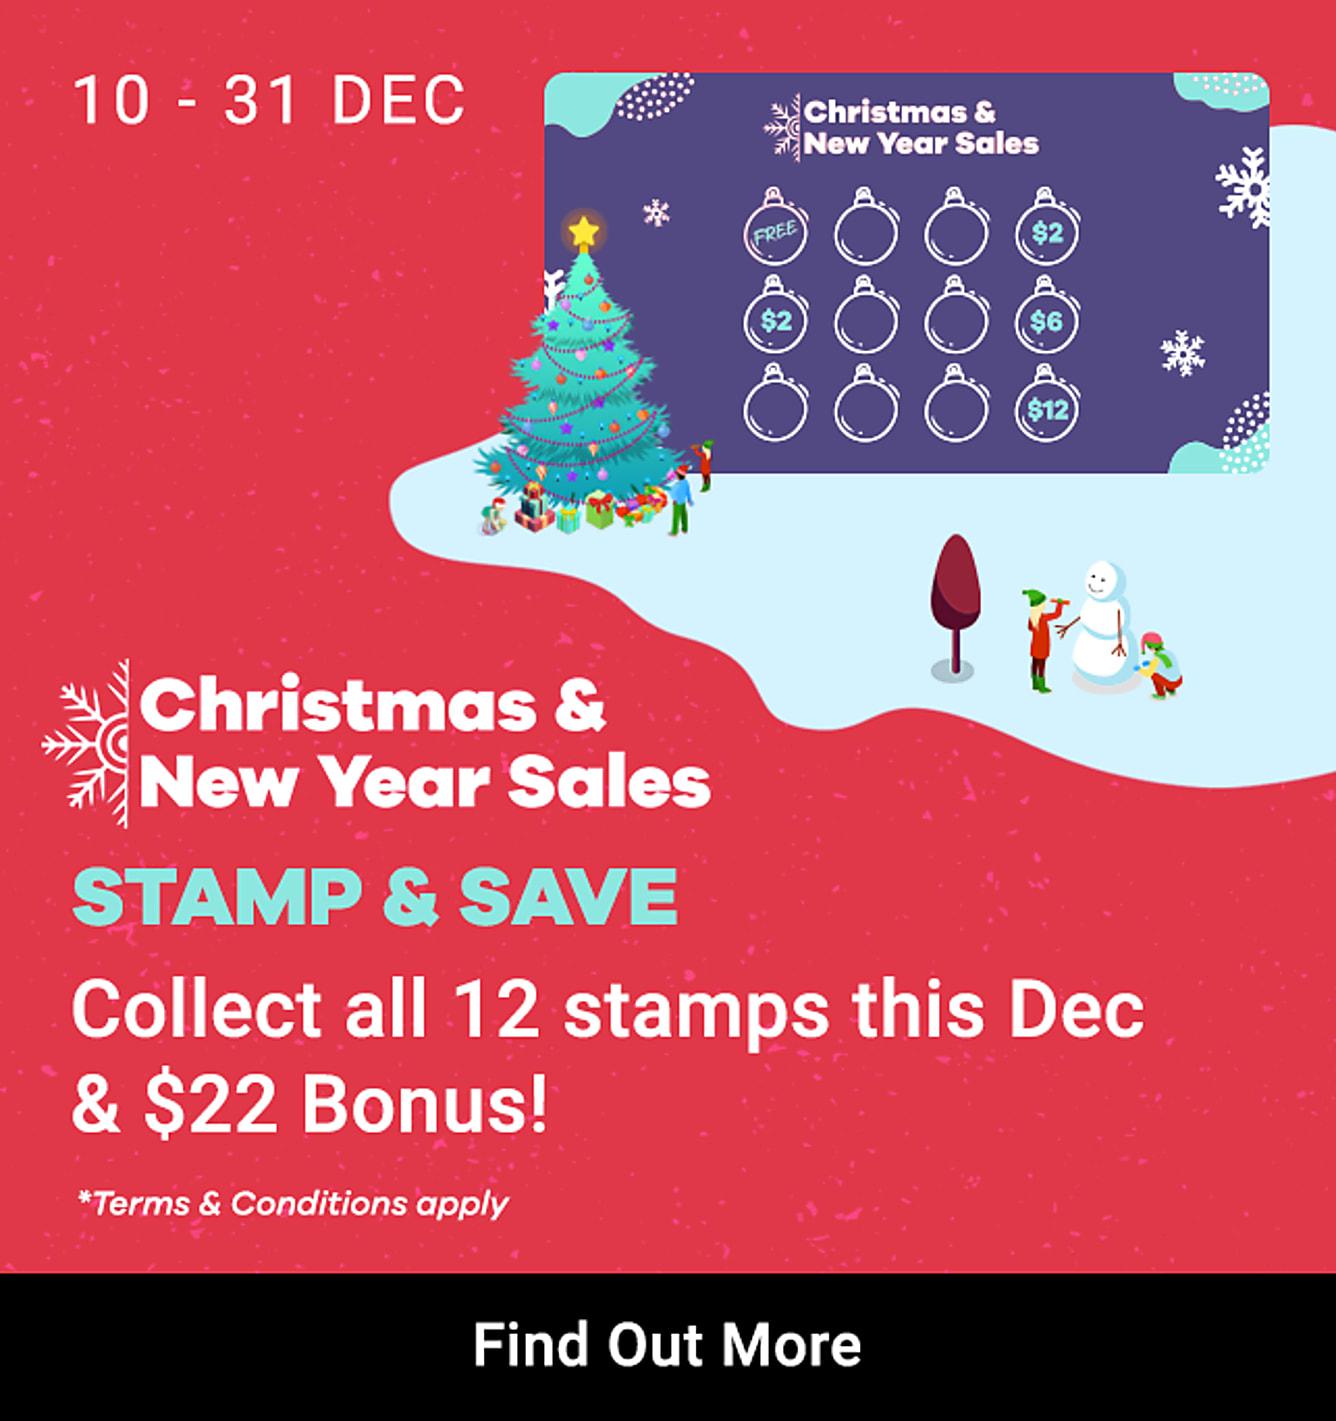 12.12 Stamp & Save